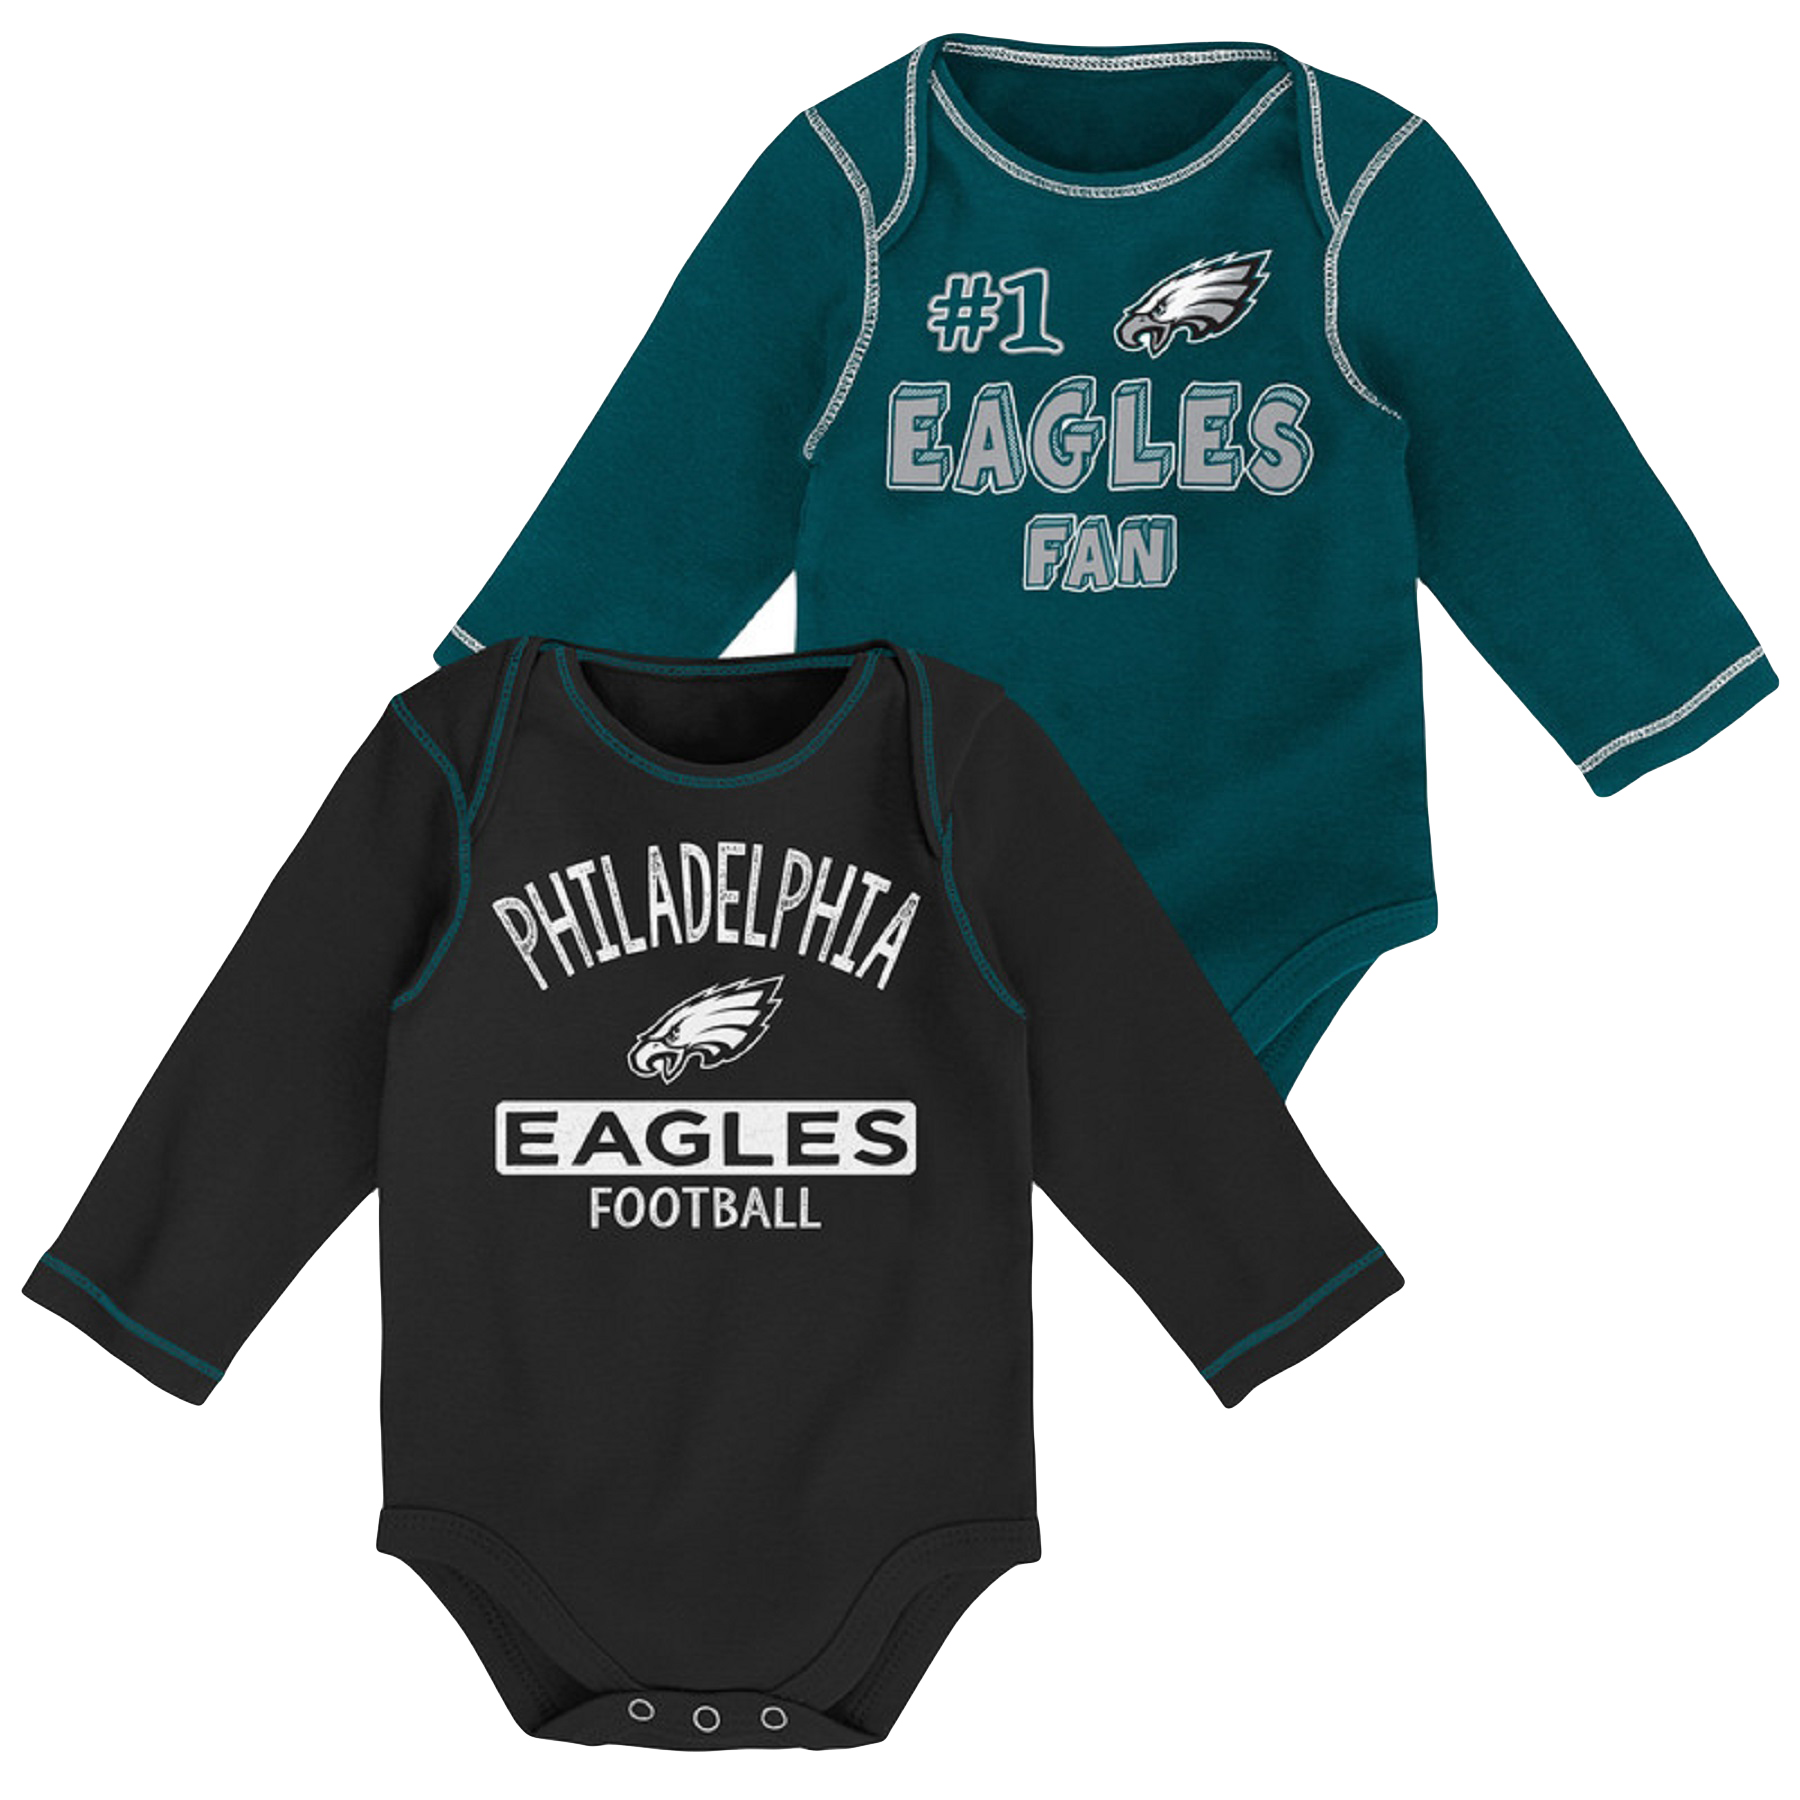 low priced f5ccf 96b54 Philadelphia Eagles Team Shop - Walmart.com